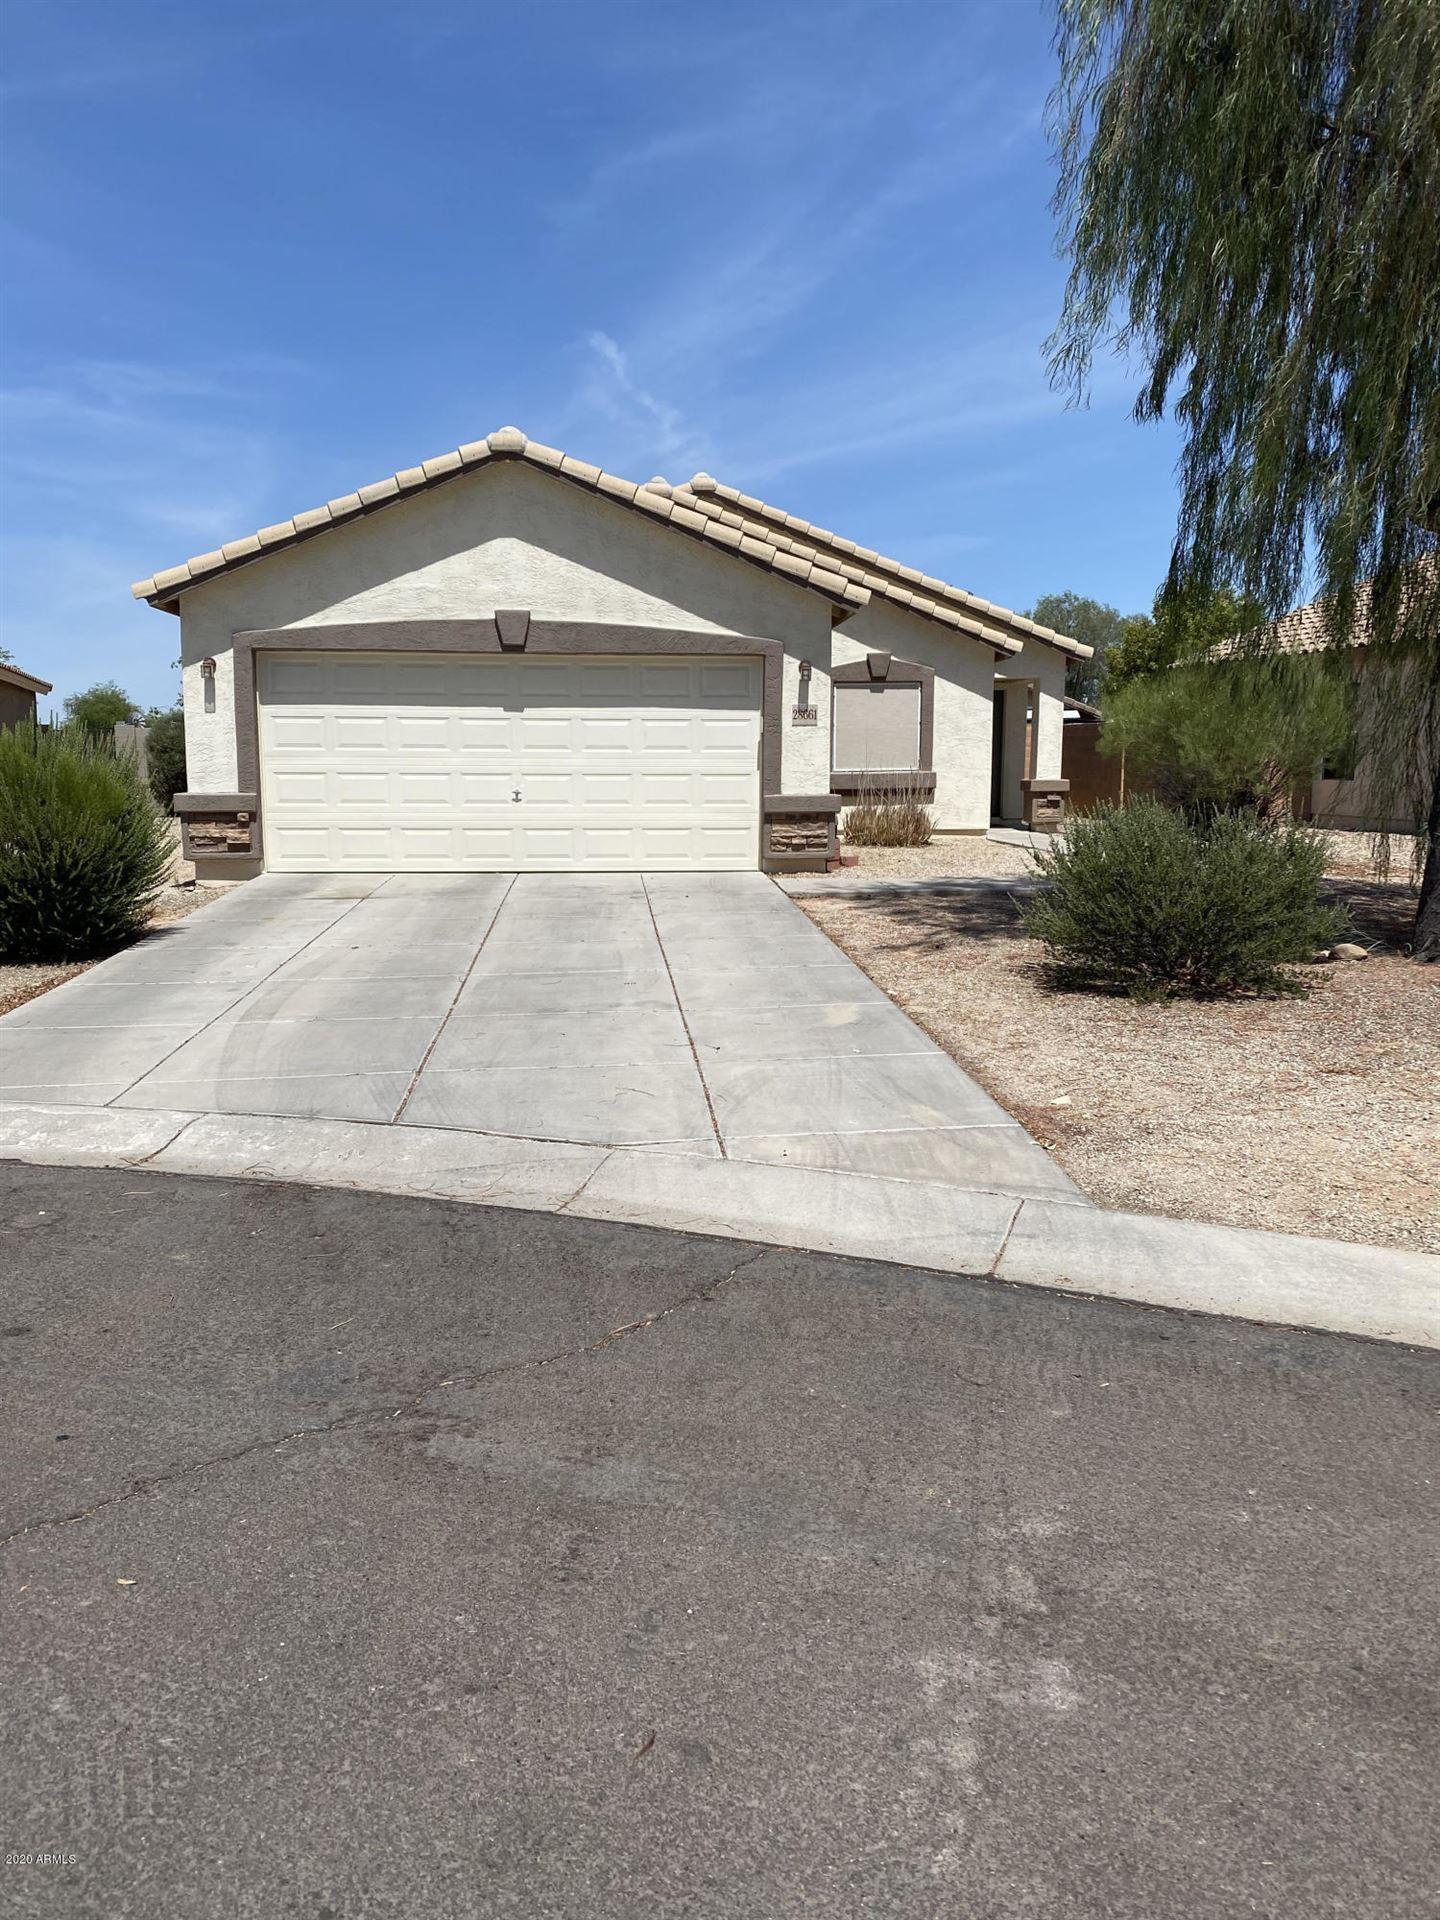 28661 N ZIRCON Court, San Tan Valley, AZ 85143 - #: 6093835